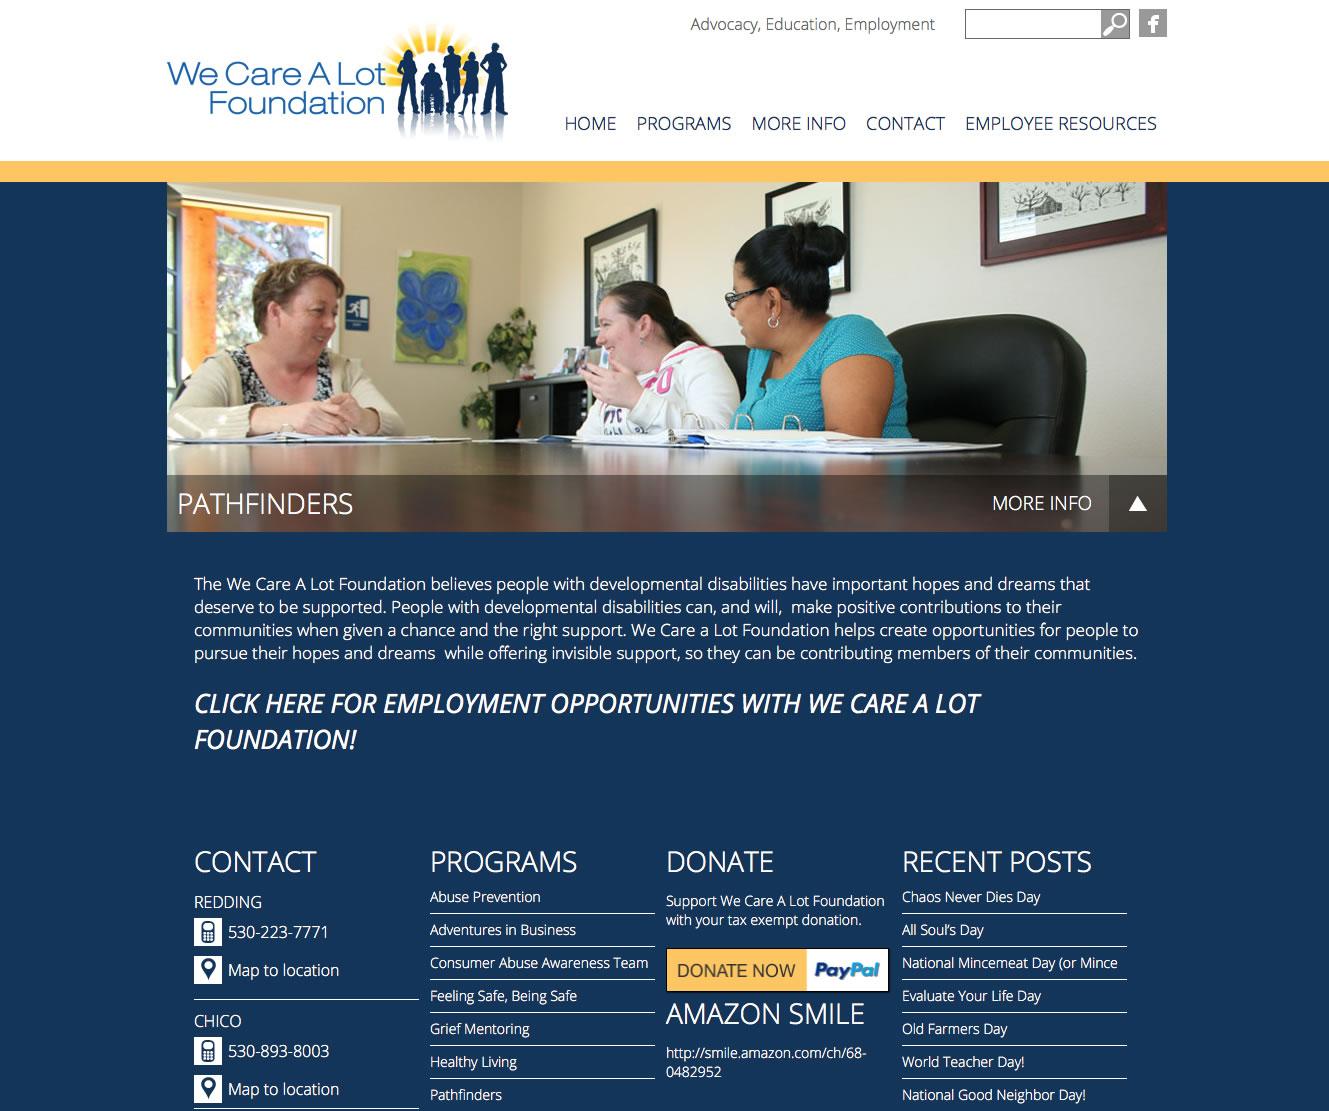 We Care A Lot Foundation website design